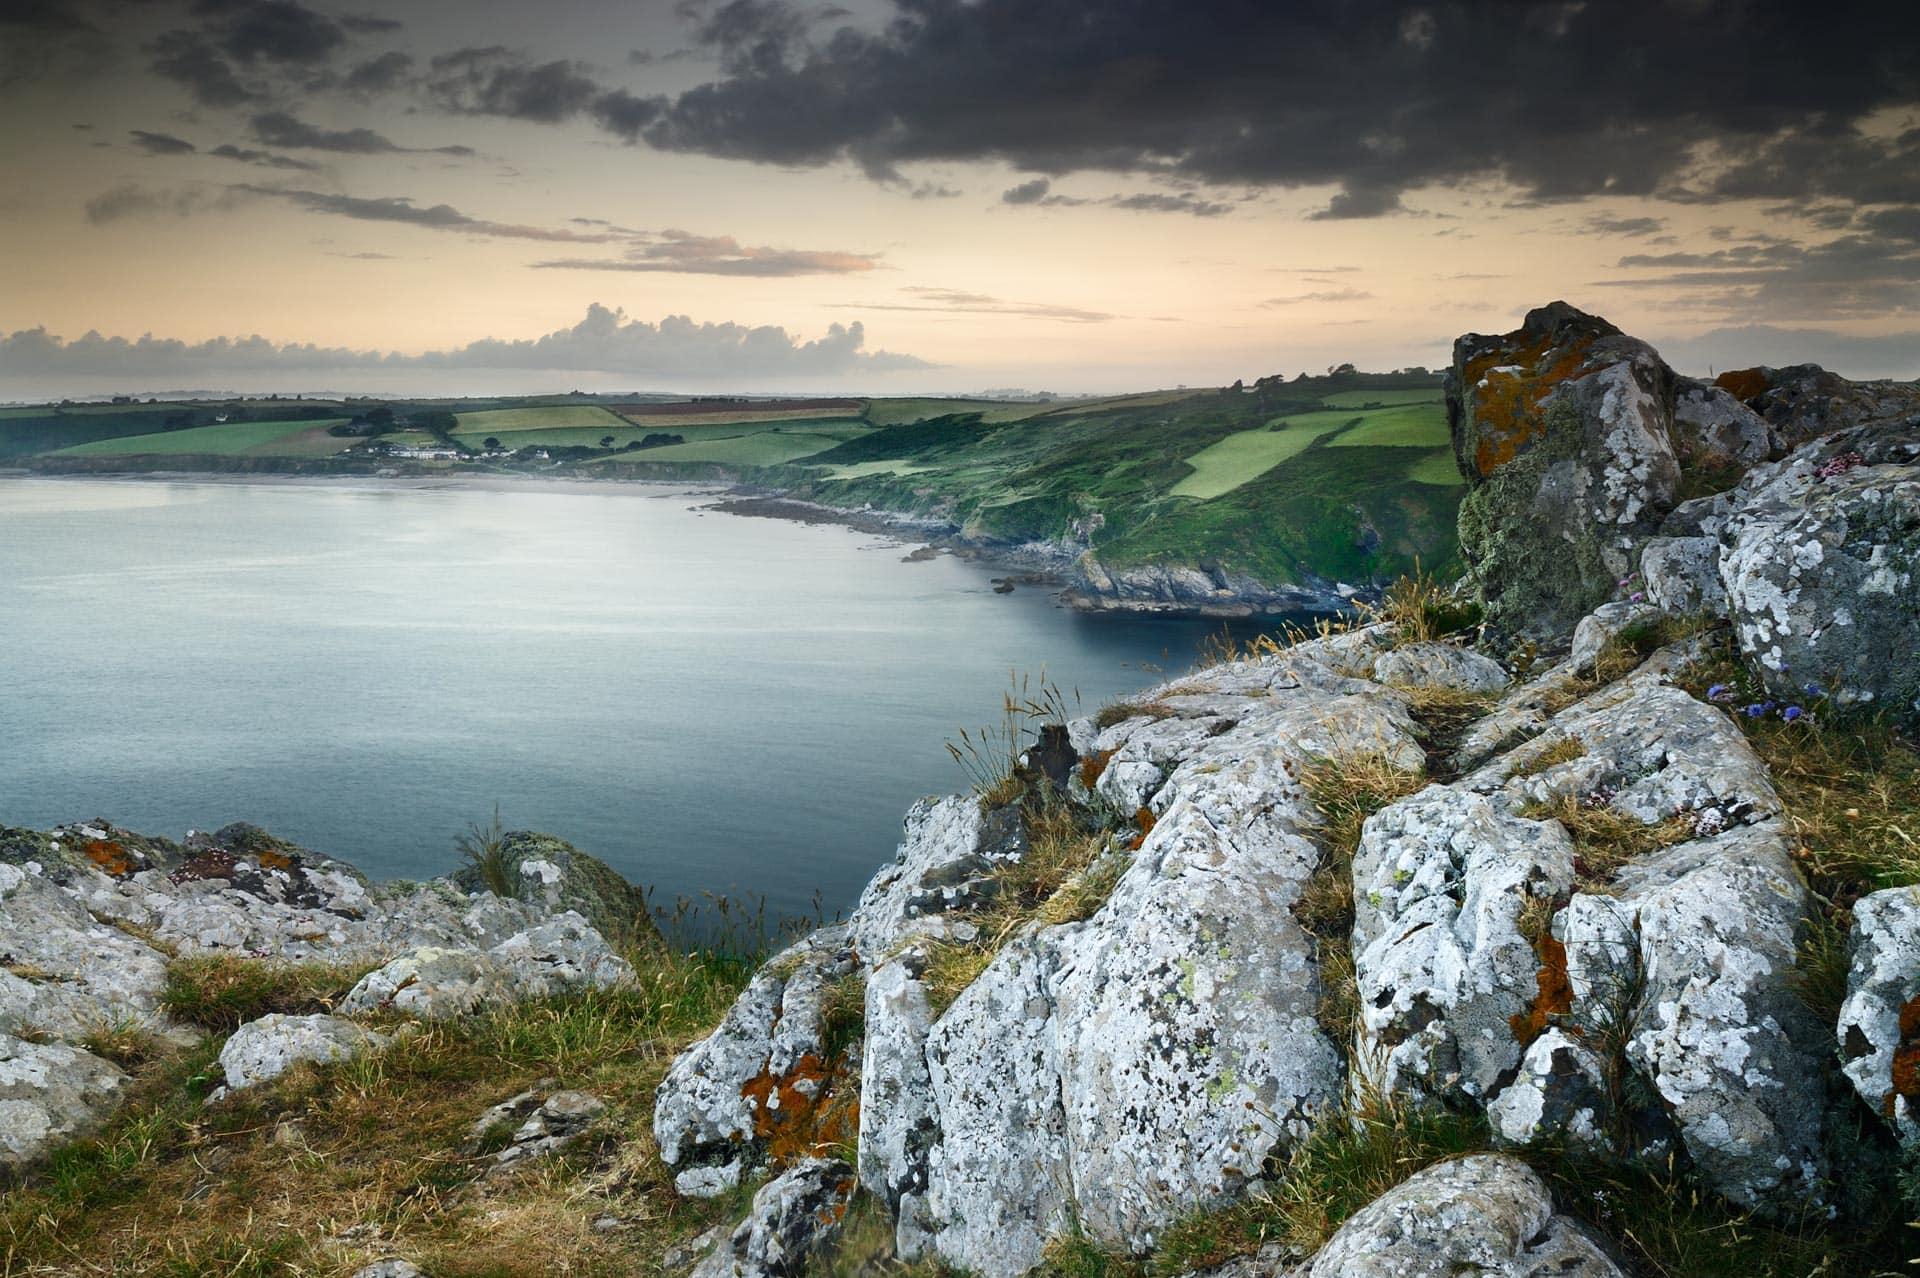 View at dawn from Nare Head, Cornwall, England, UK